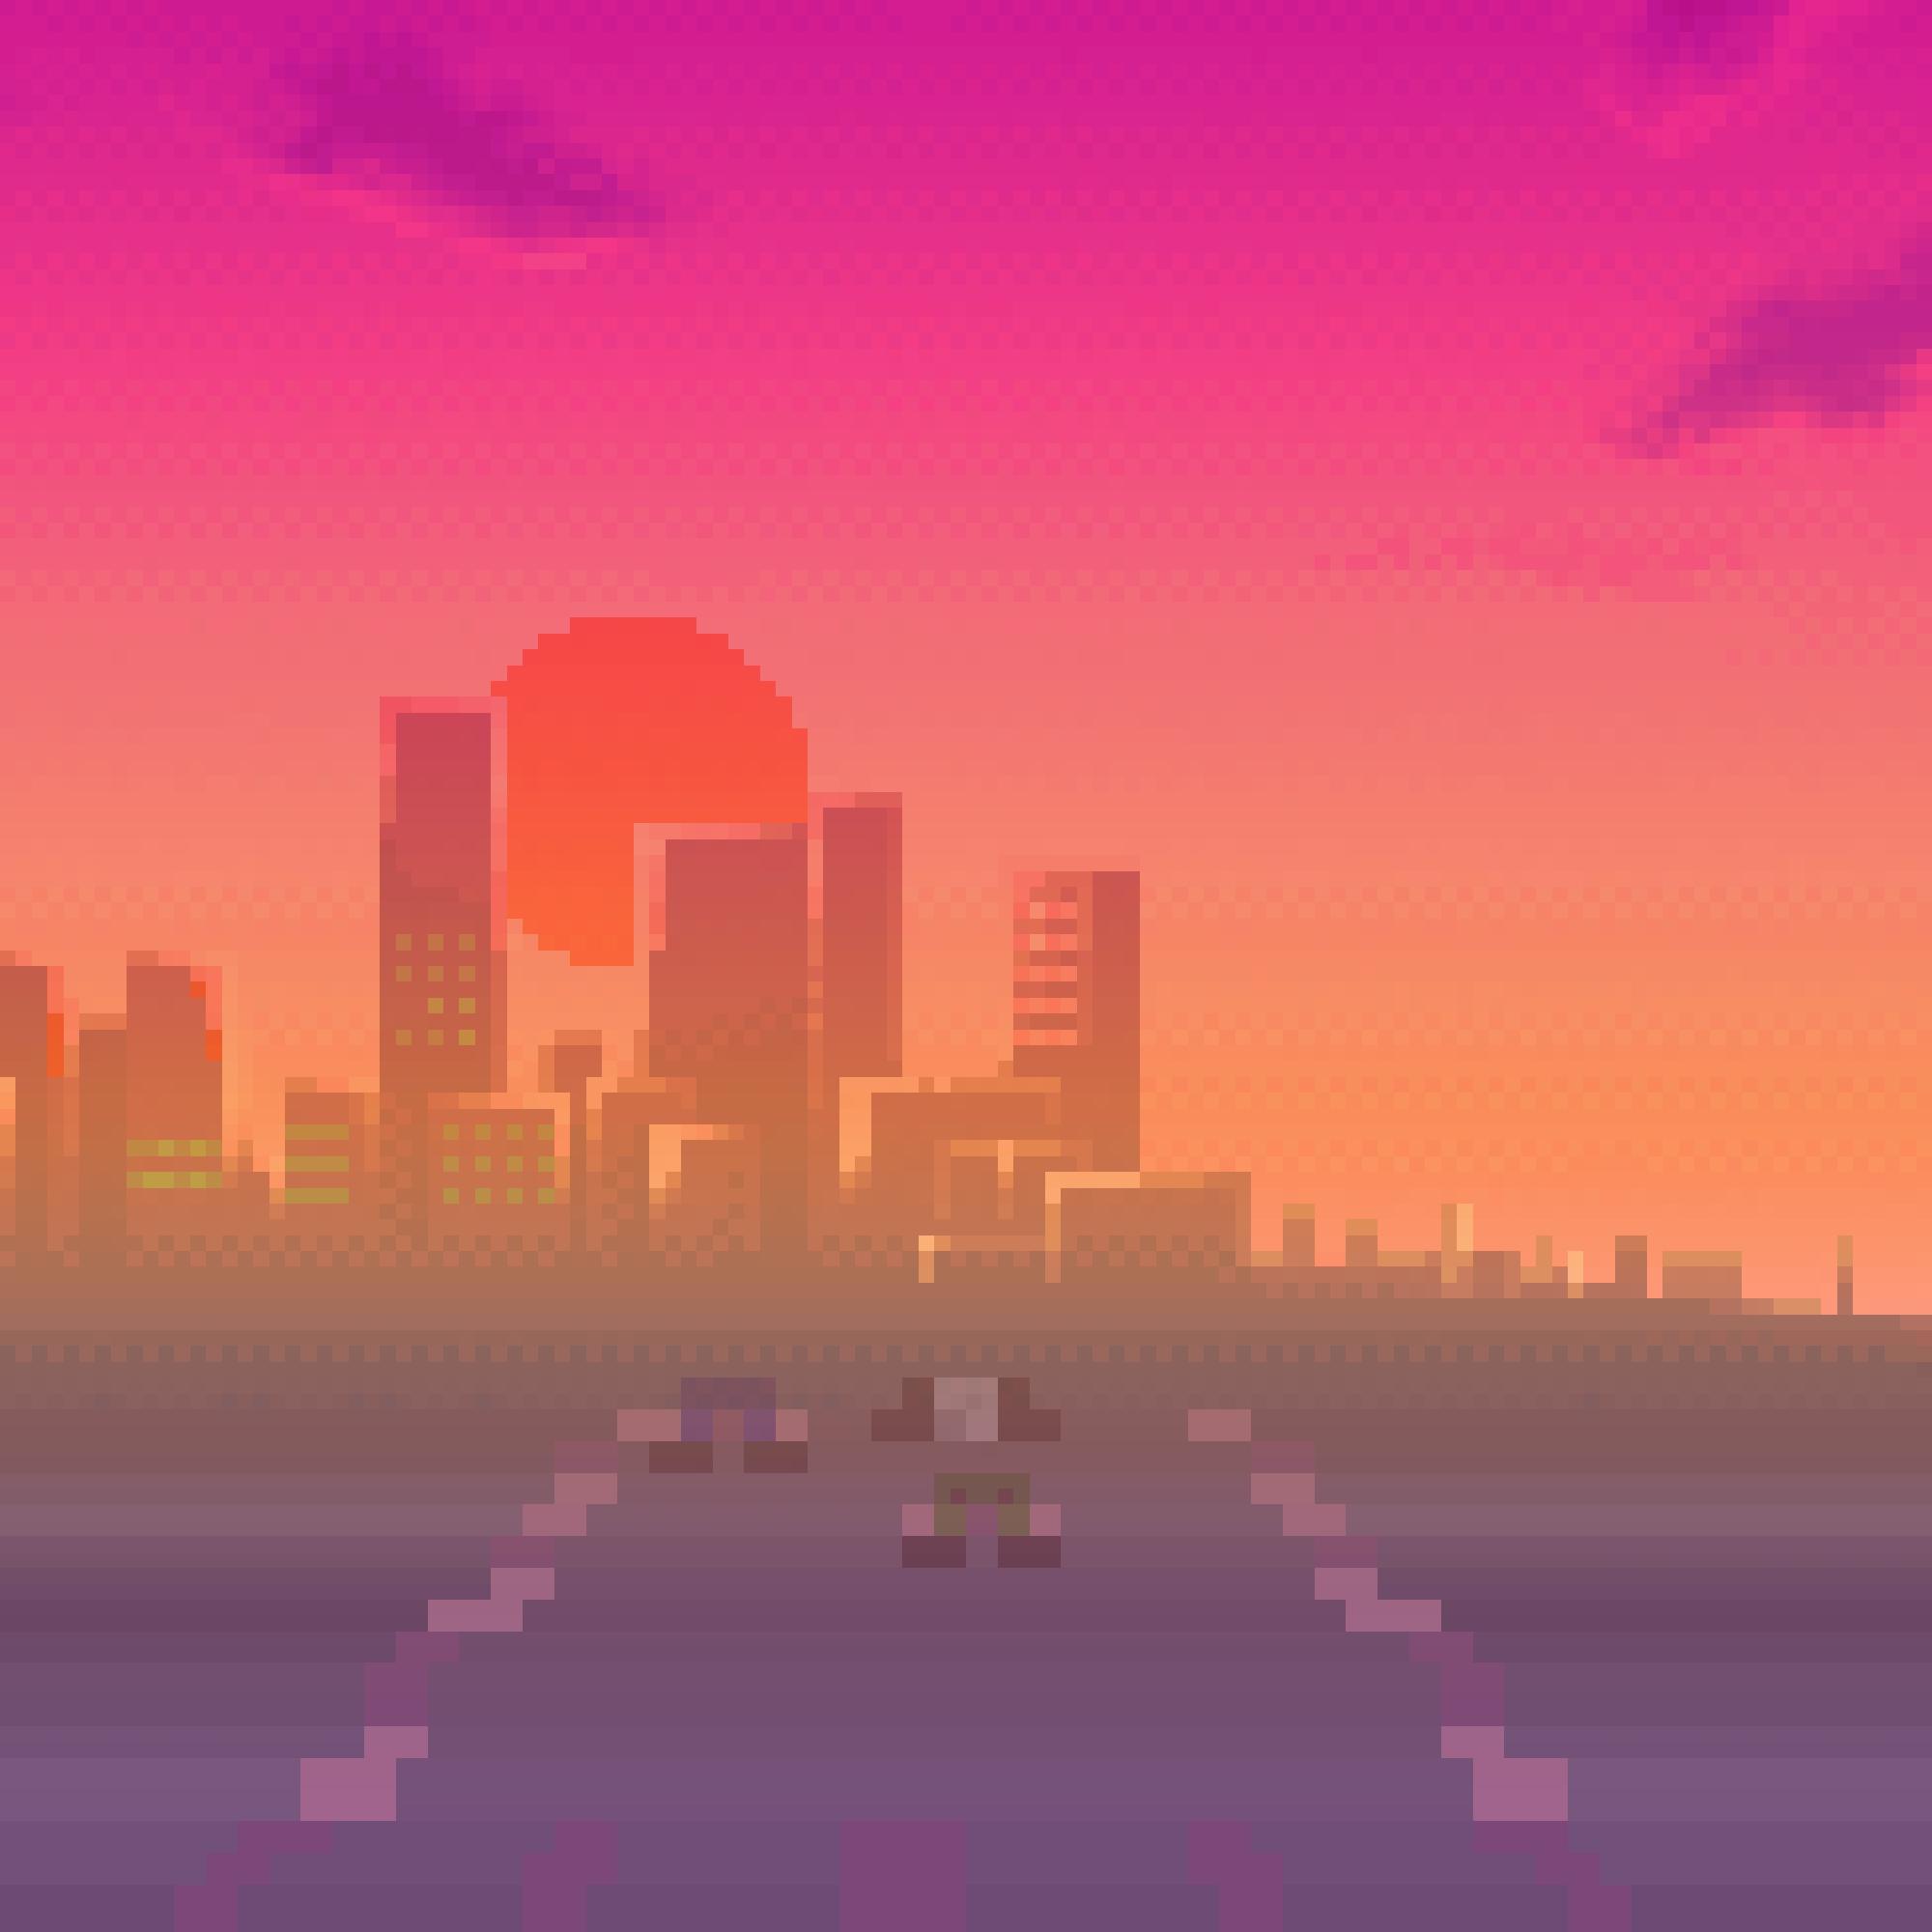 sunset-pixel-art.png